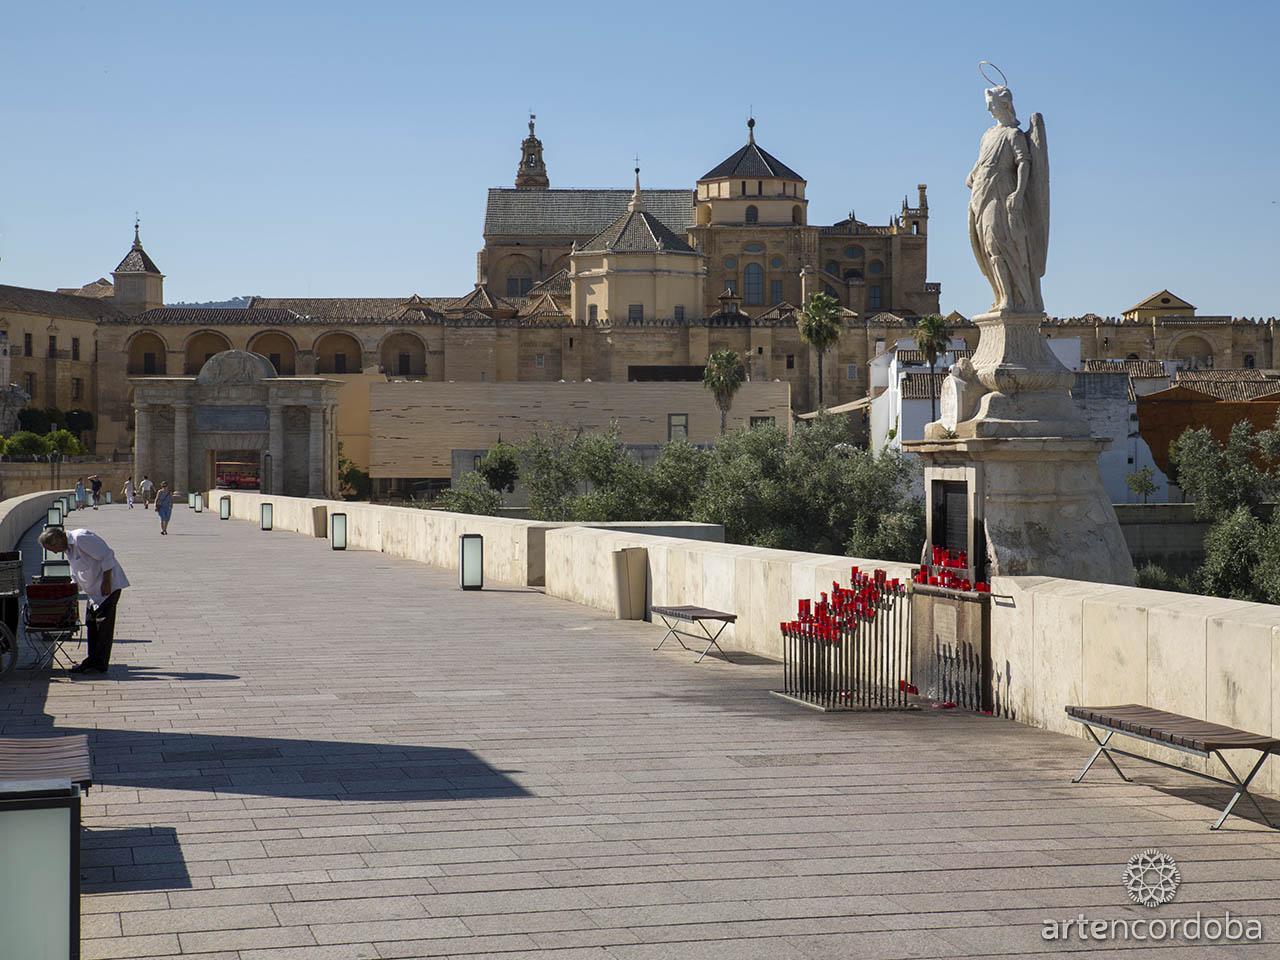 Triunfo de San Rafael del Puente Romano de Córdoba